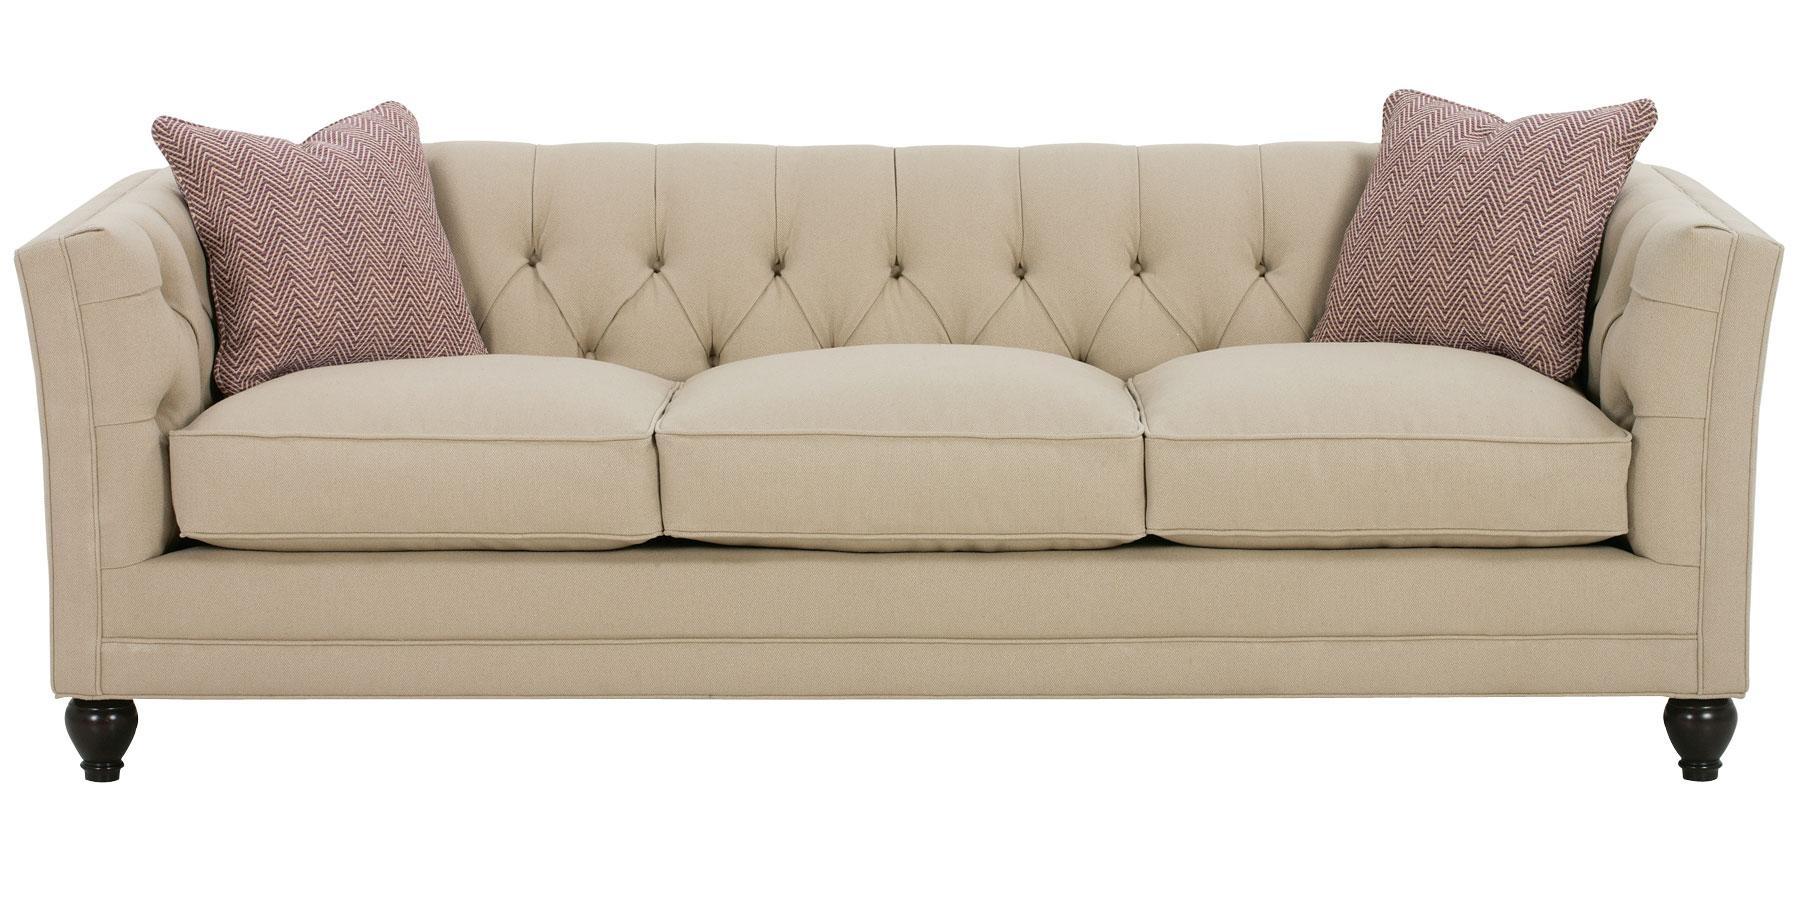 Sofas Center : Condo Size Sectional Sofa Toronto Gallery Image With Regard To Condo Size Sofas (Image 20 of 20)